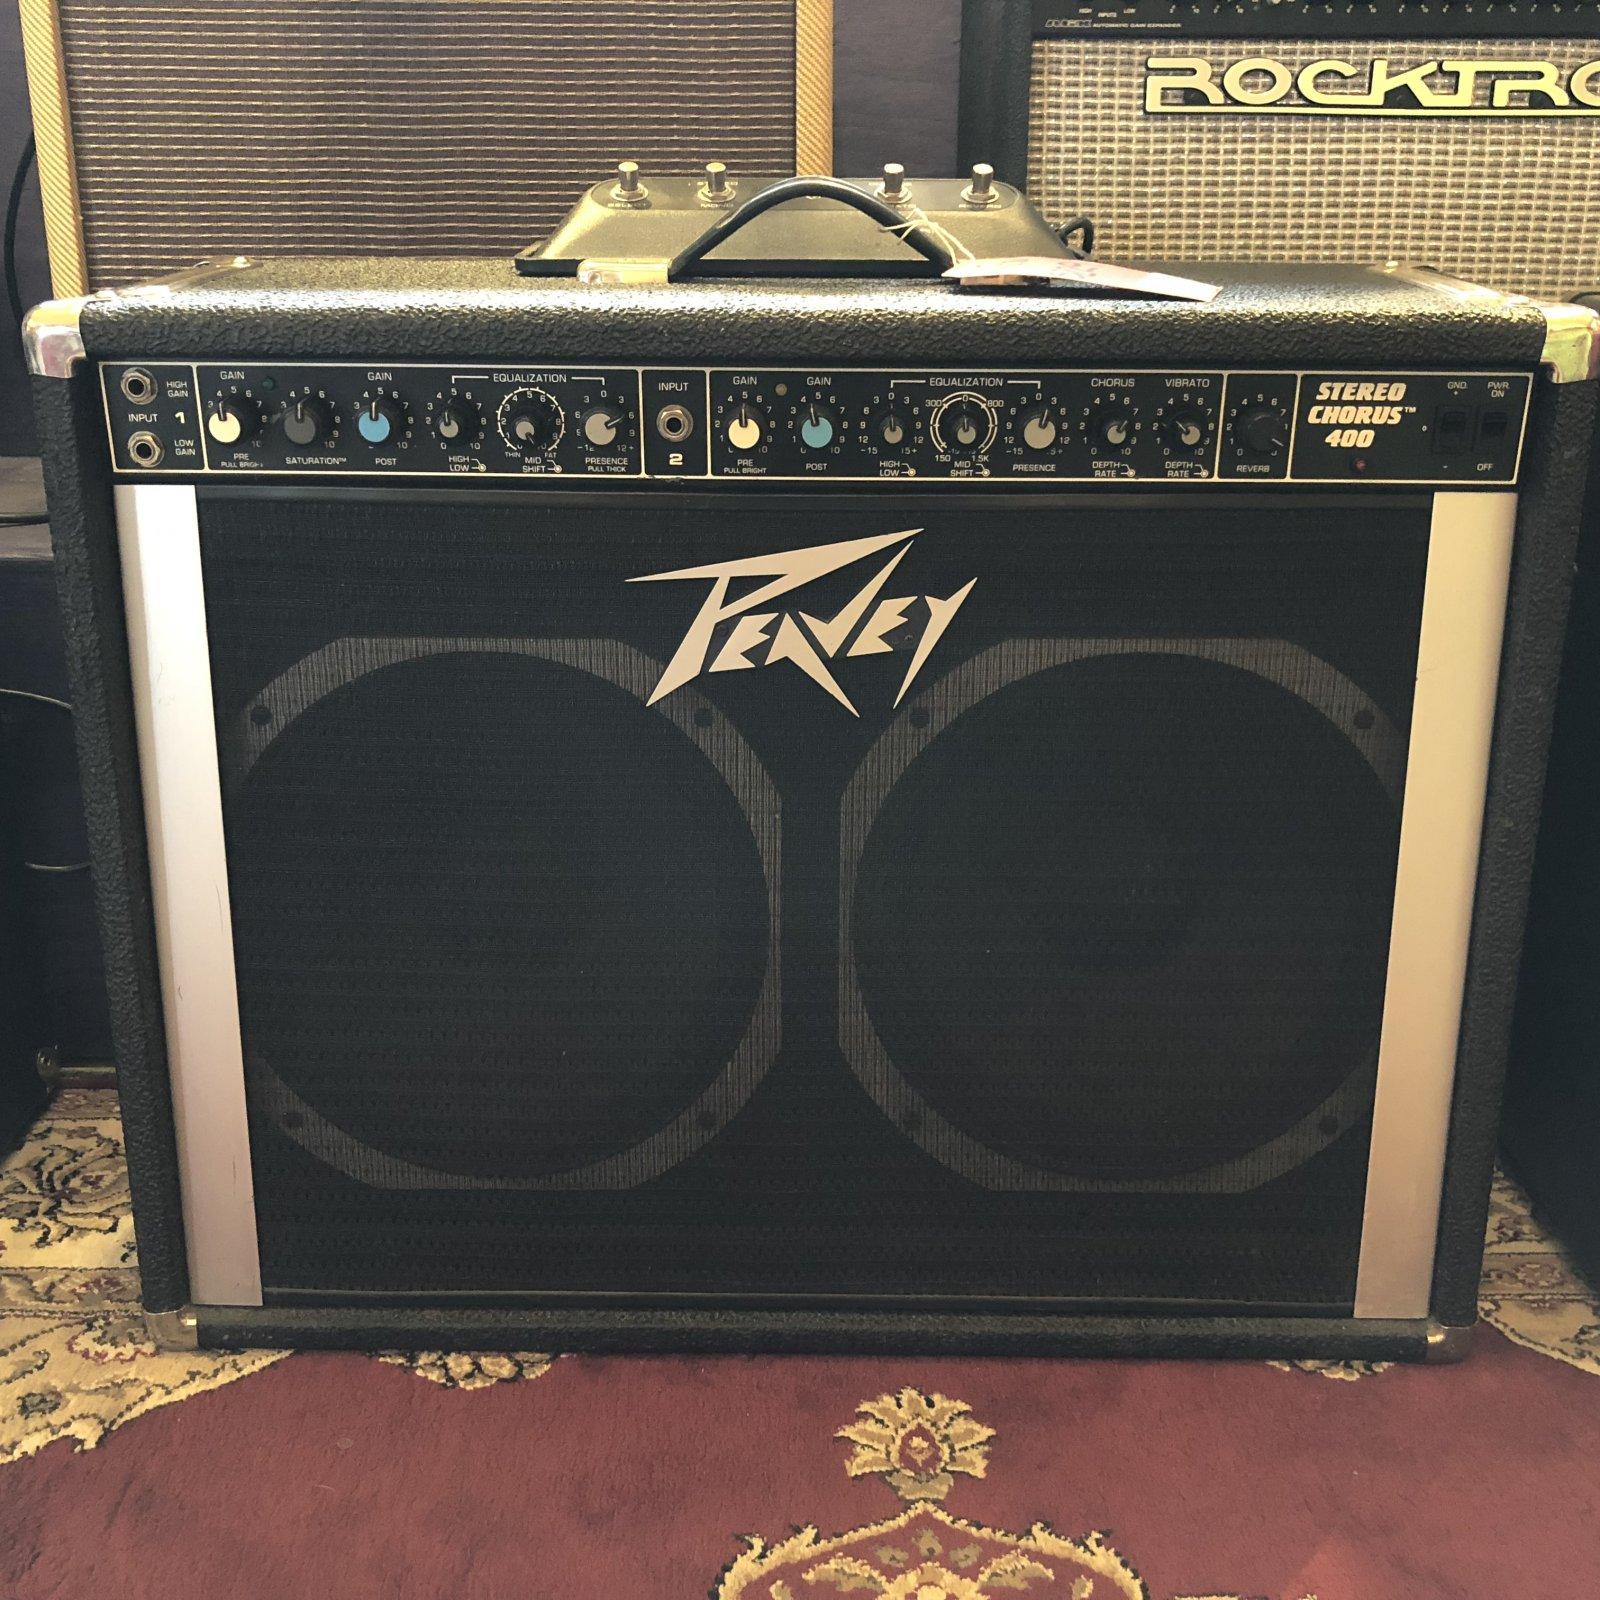 Used Peavey Stereo Chorus 400